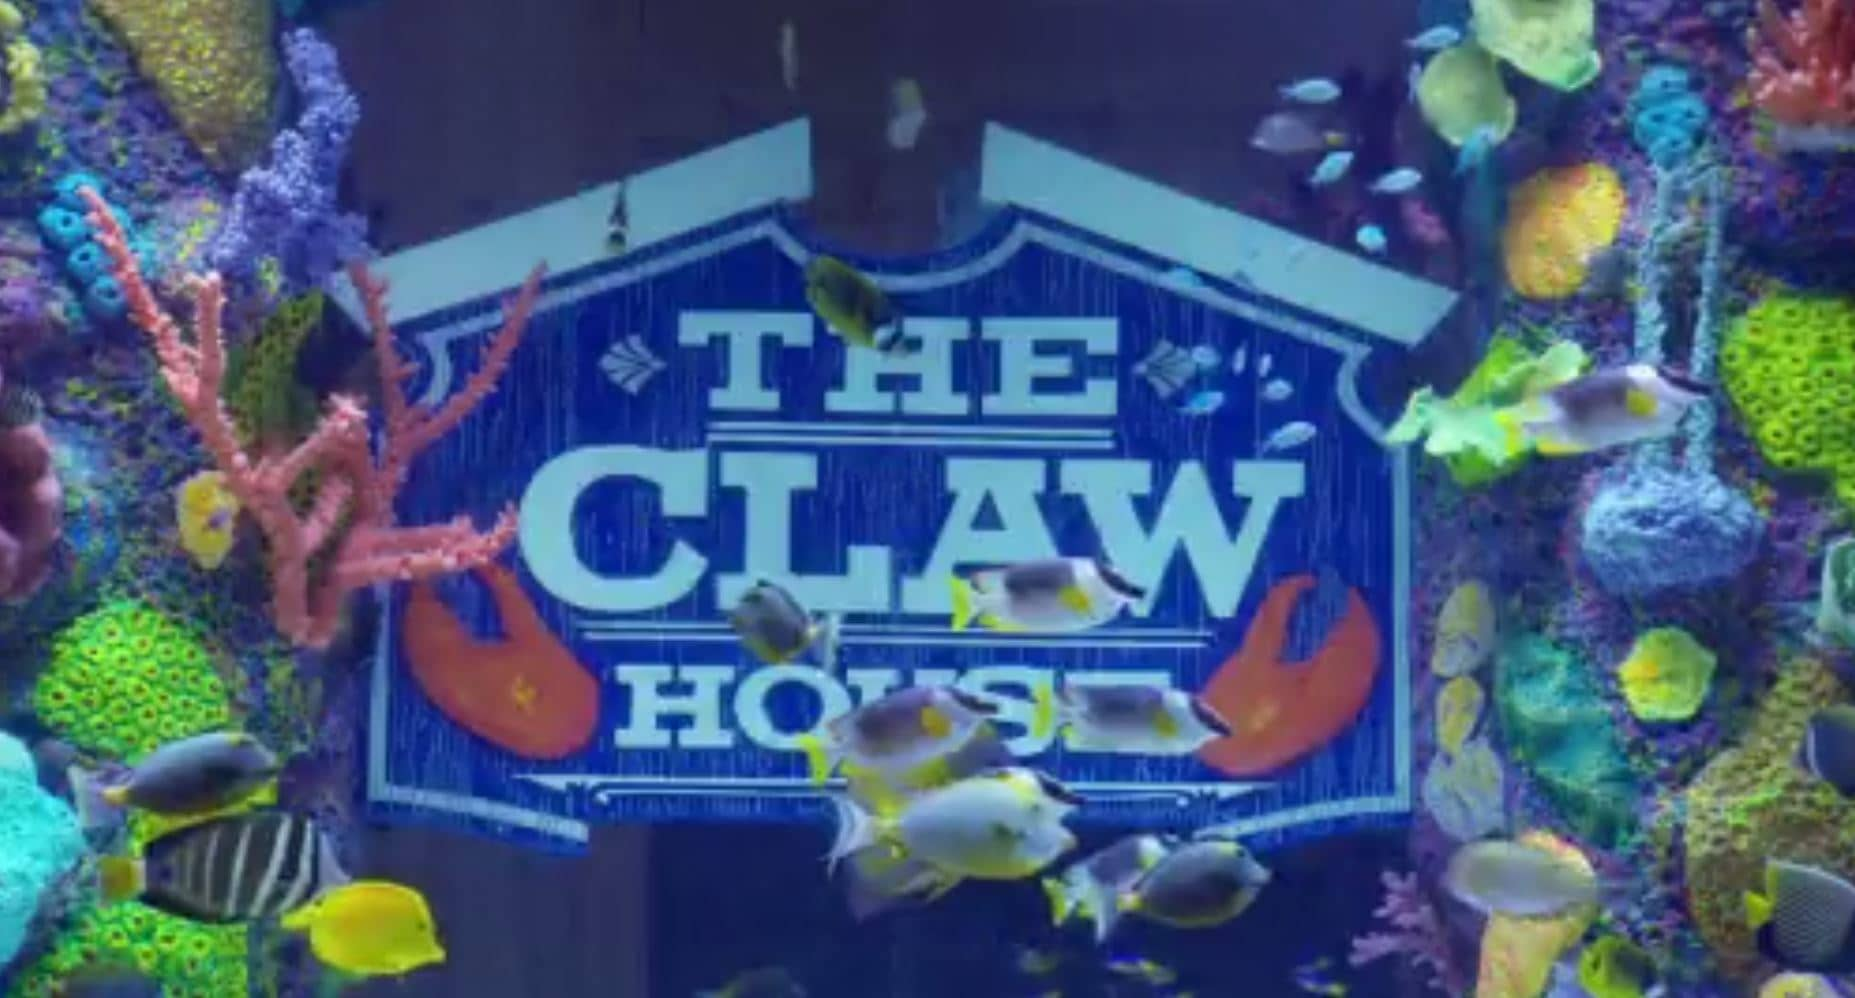 clawHouseTank